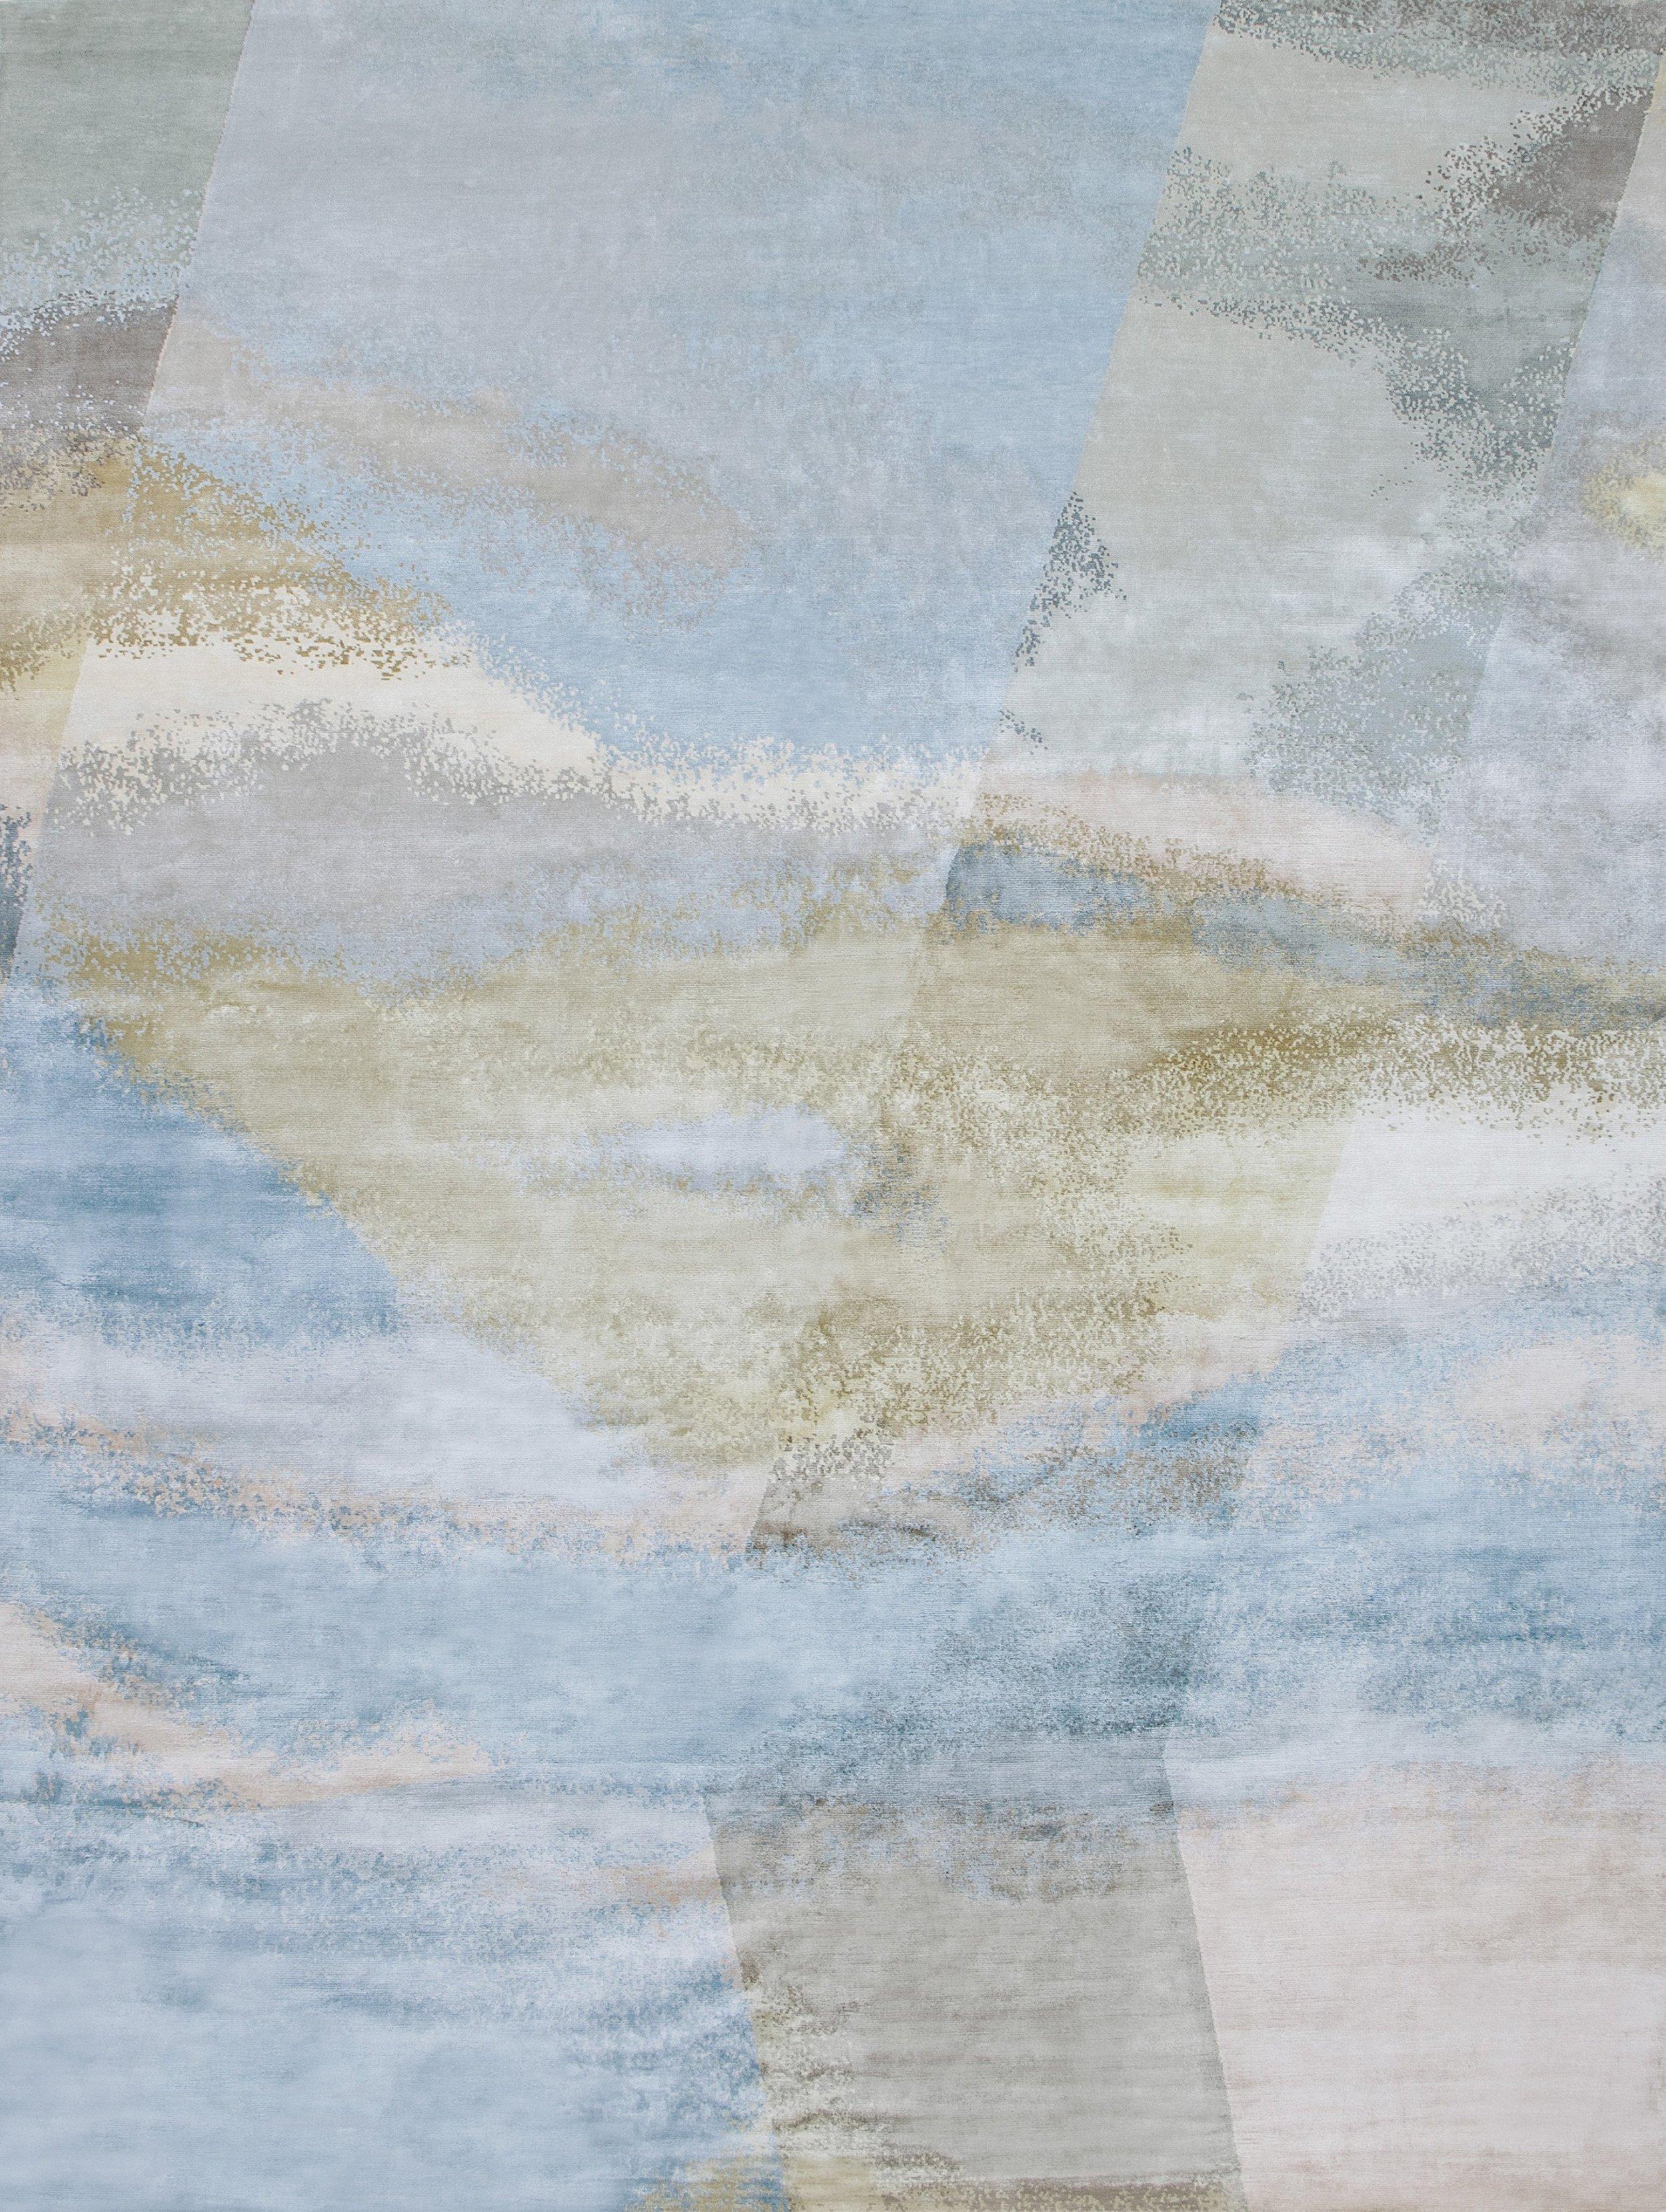 aral-sunrise-8334c635-xlarge.jpg